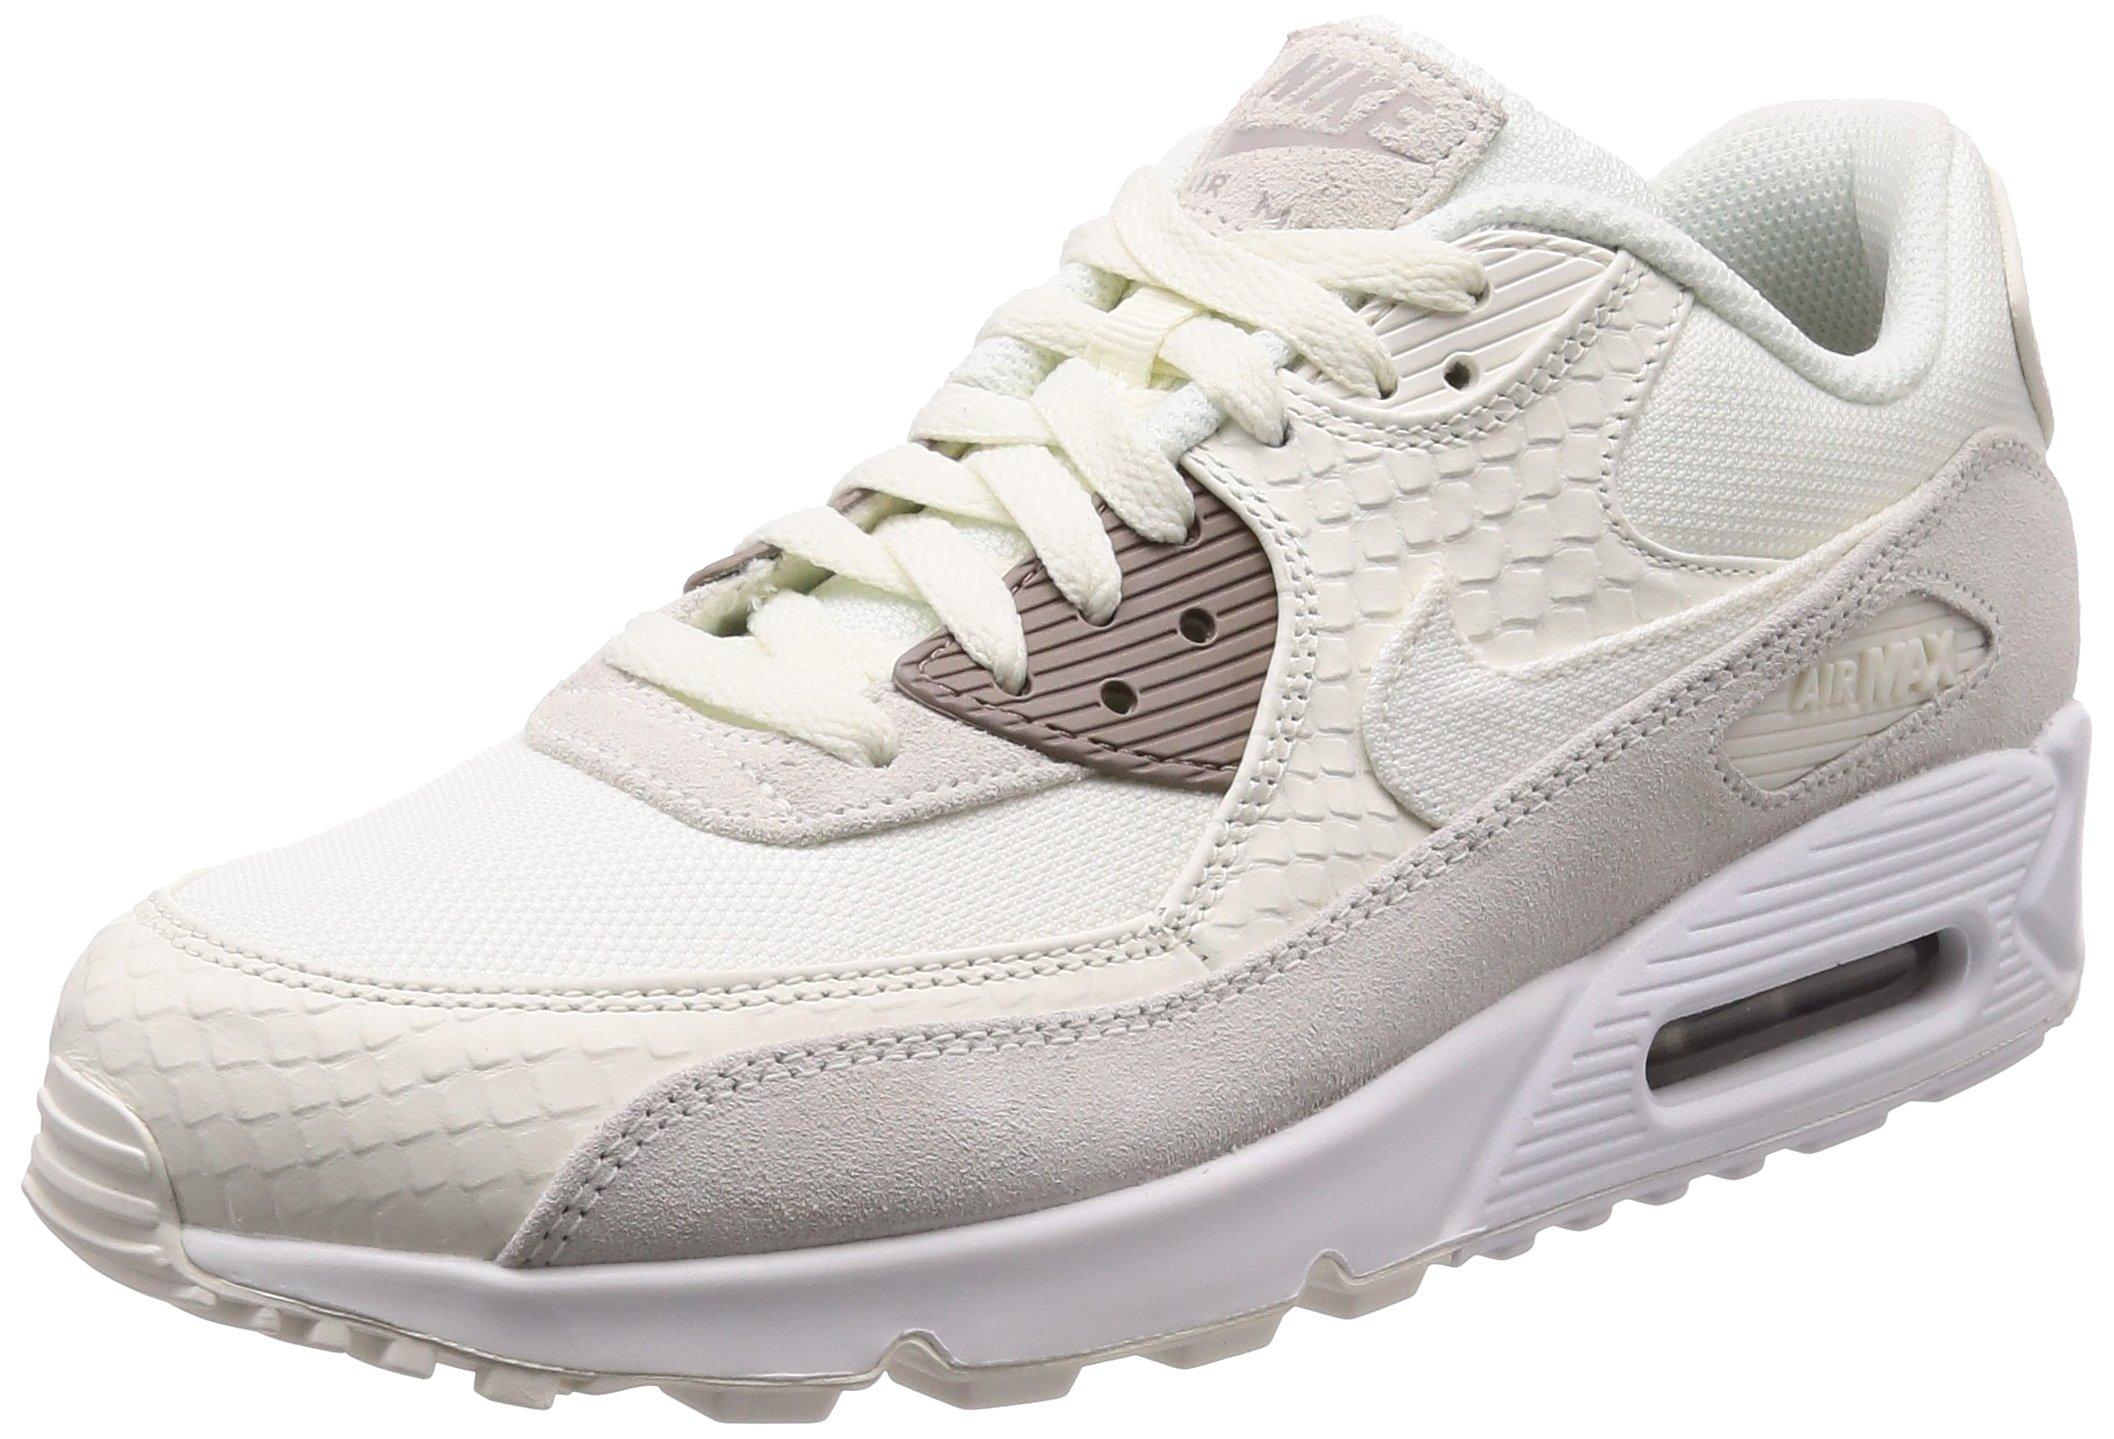 los angeles 07070 a5891 Galleon - Nike Air Max 90 Premium (Exotic Skin)